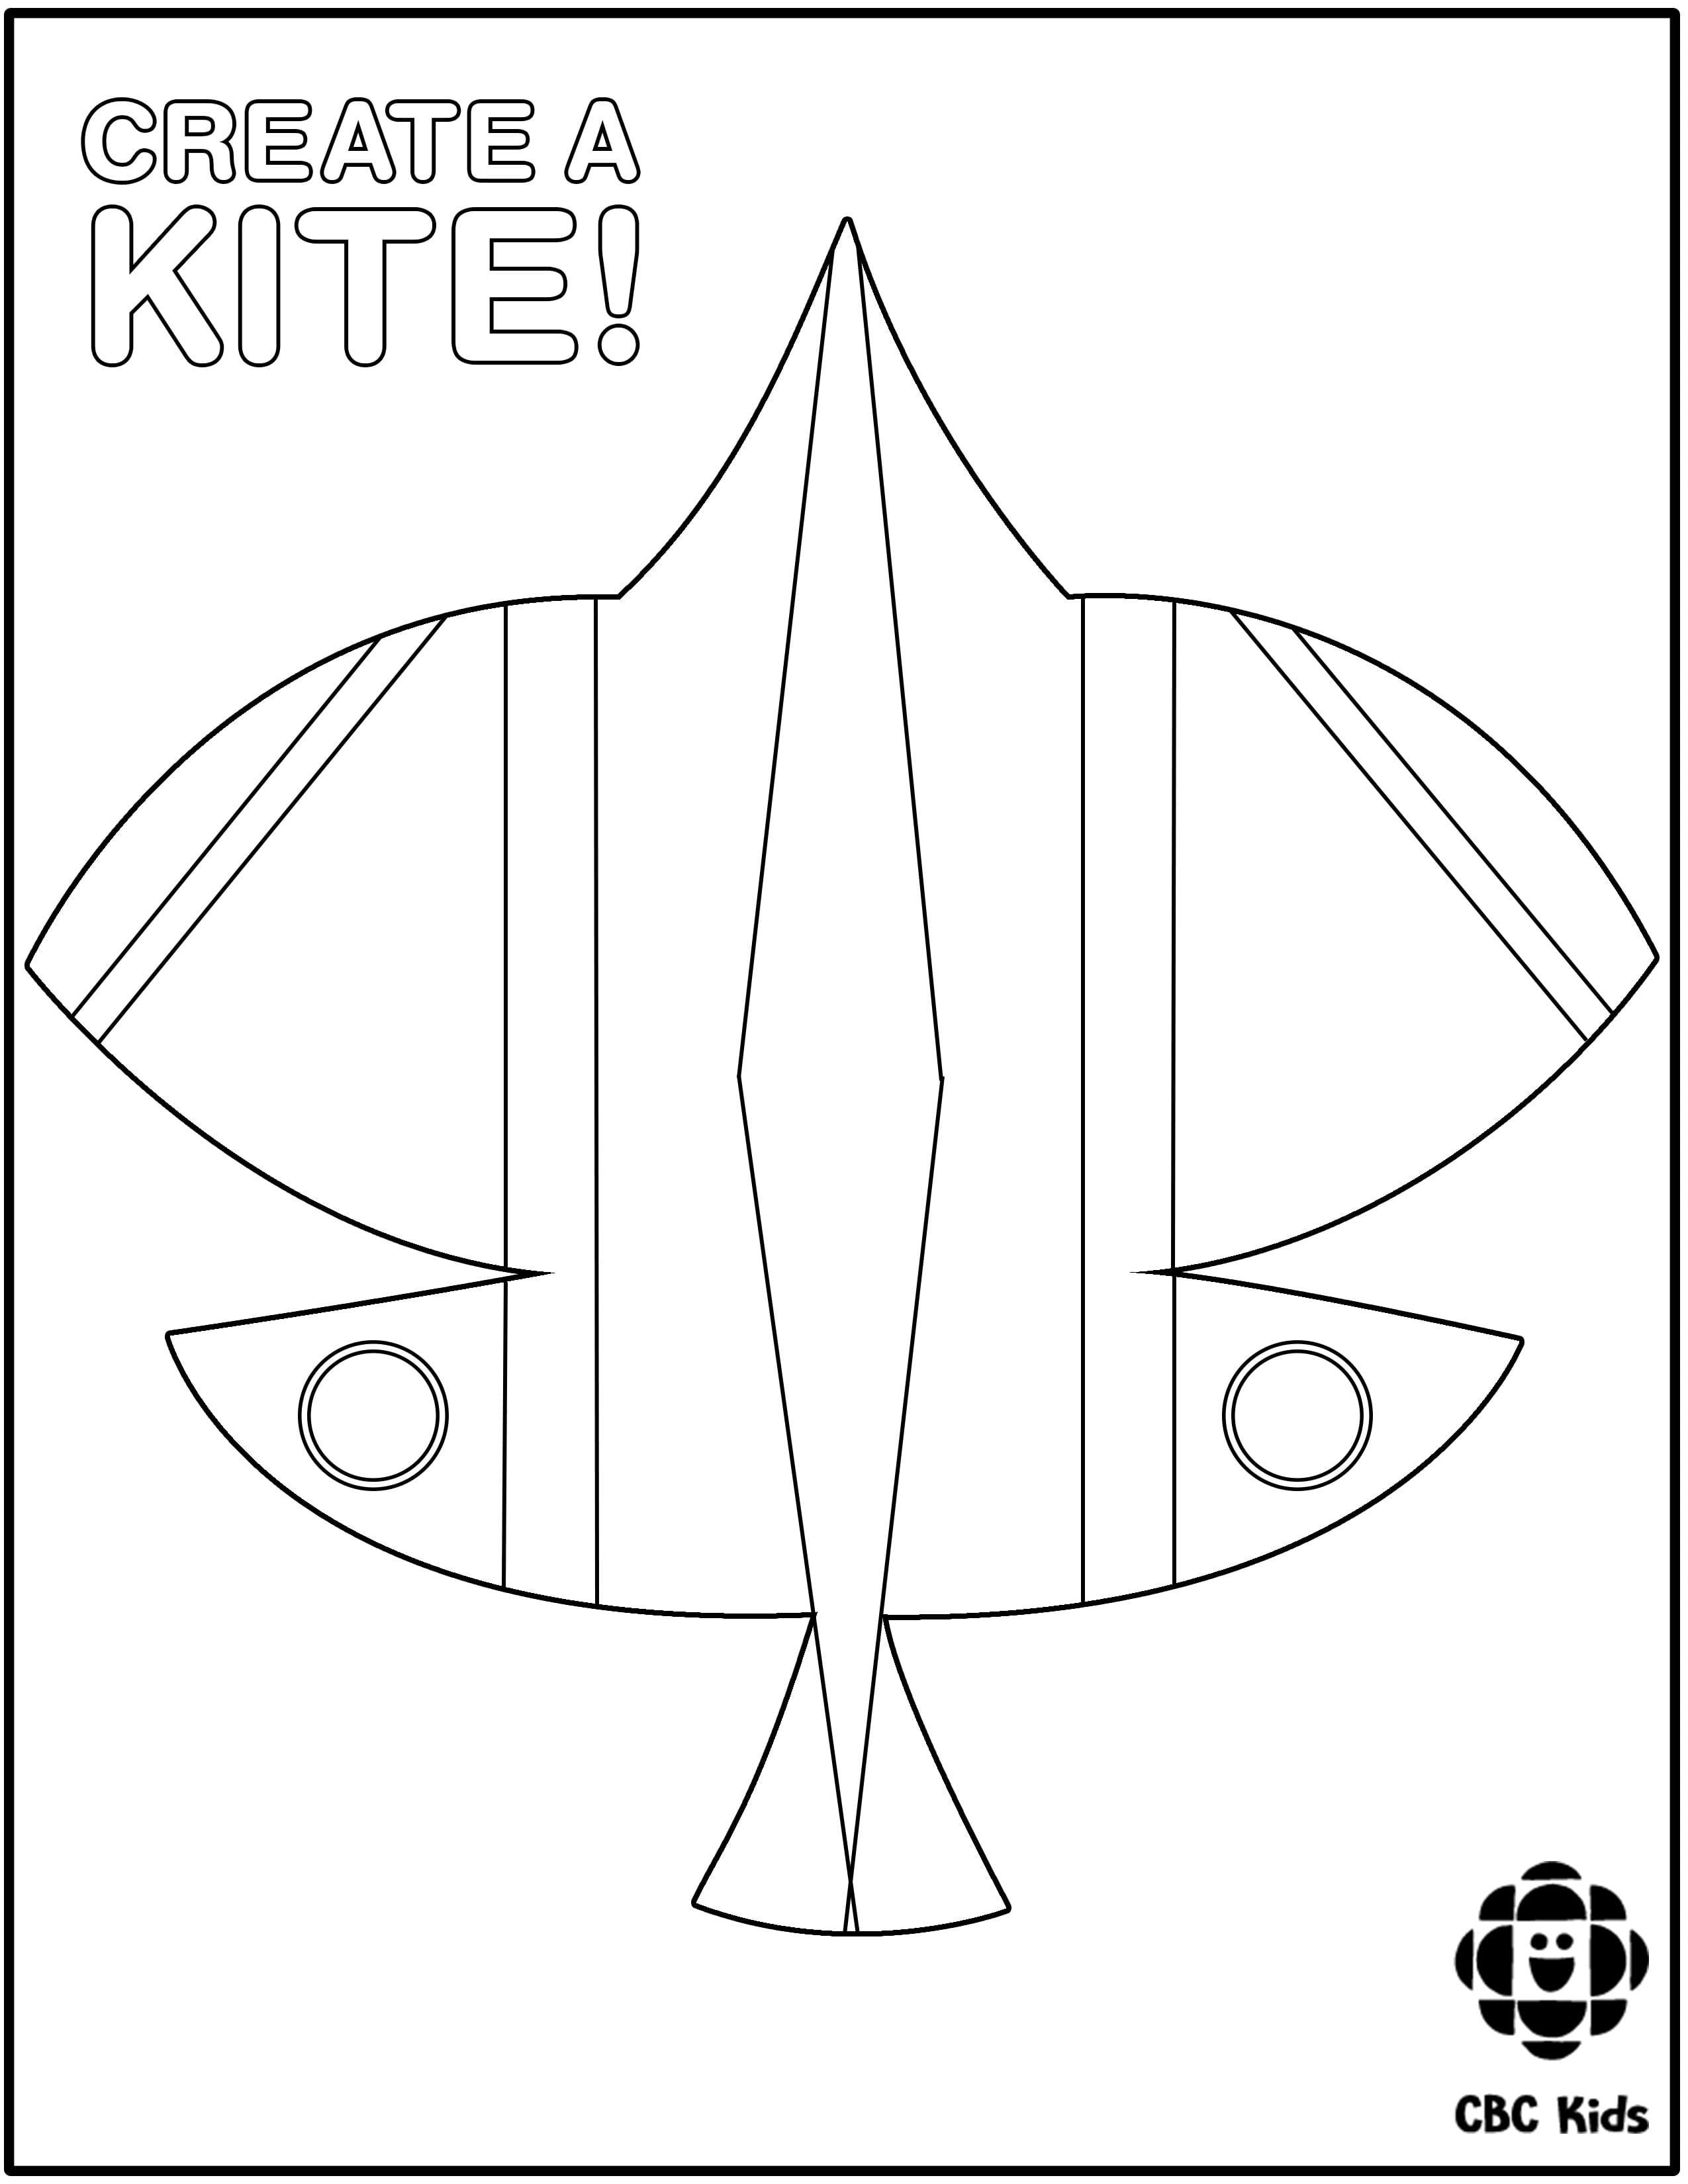 Colouring sheet featuring a basant kite.